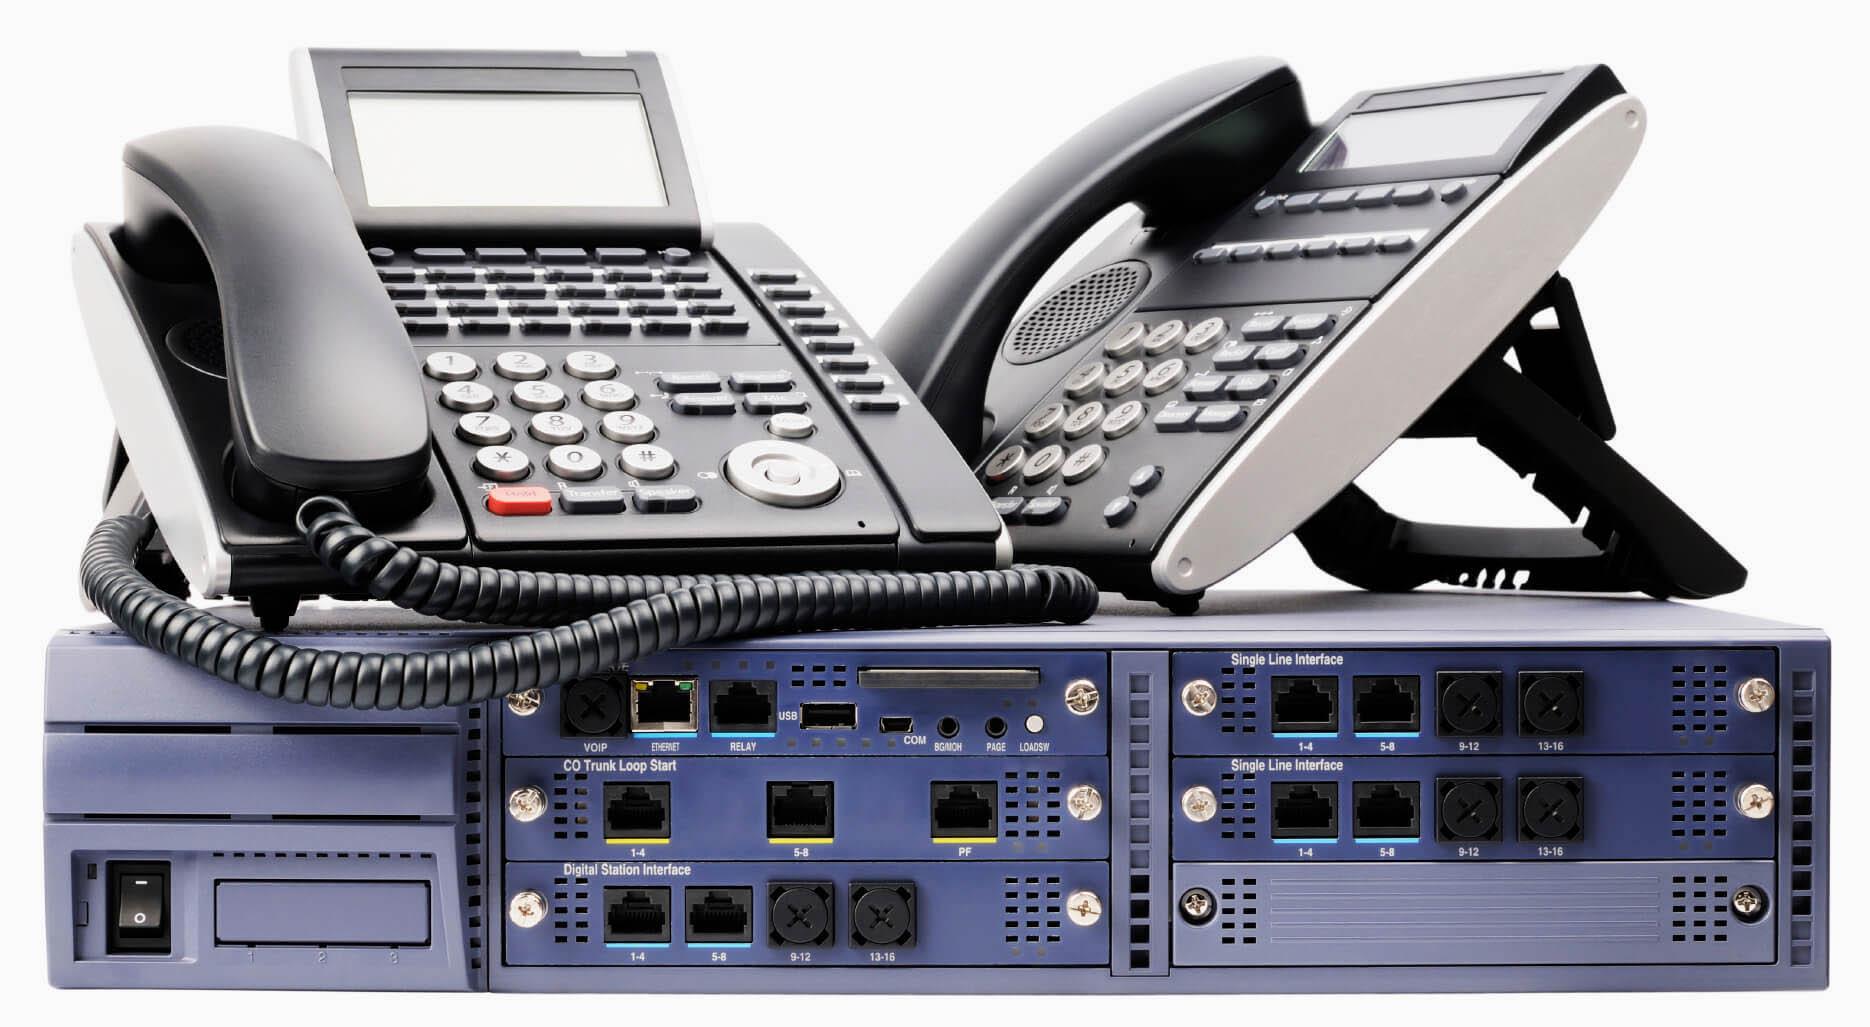 TechCore IP Phone Systems